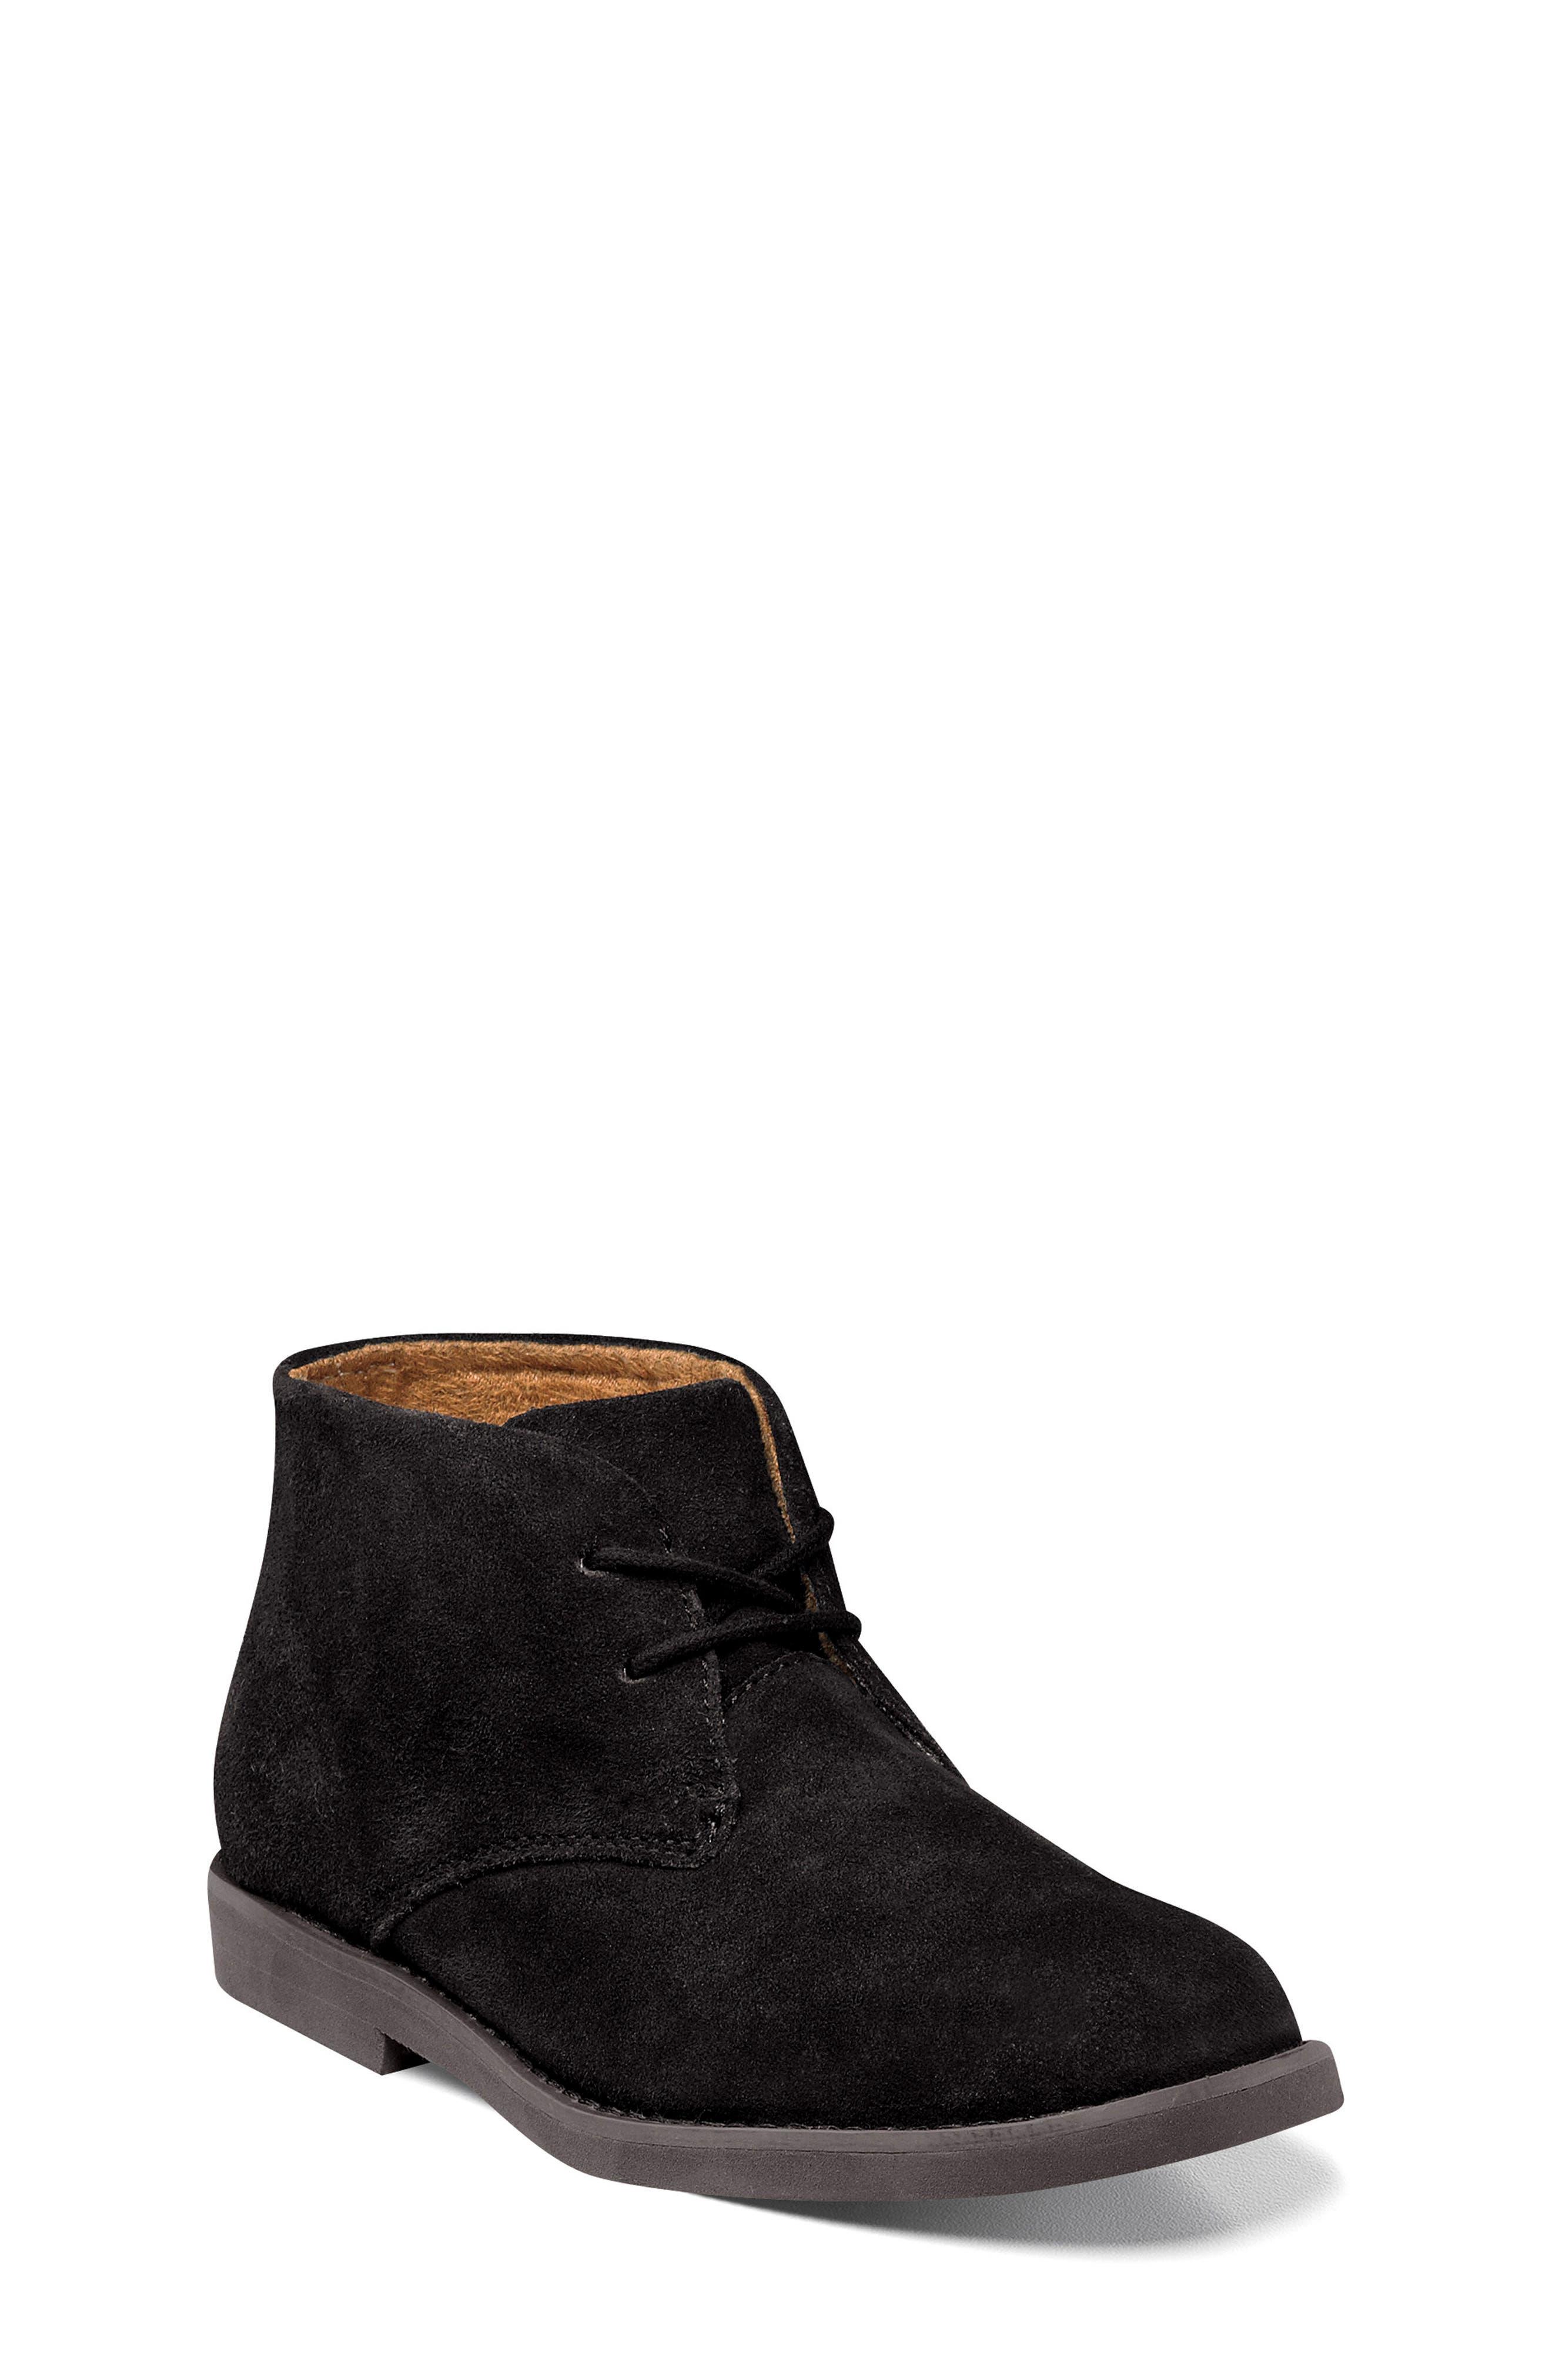 'Quinlan' Chukka Boot,                             Alternate thumbnail 2, color,                             001